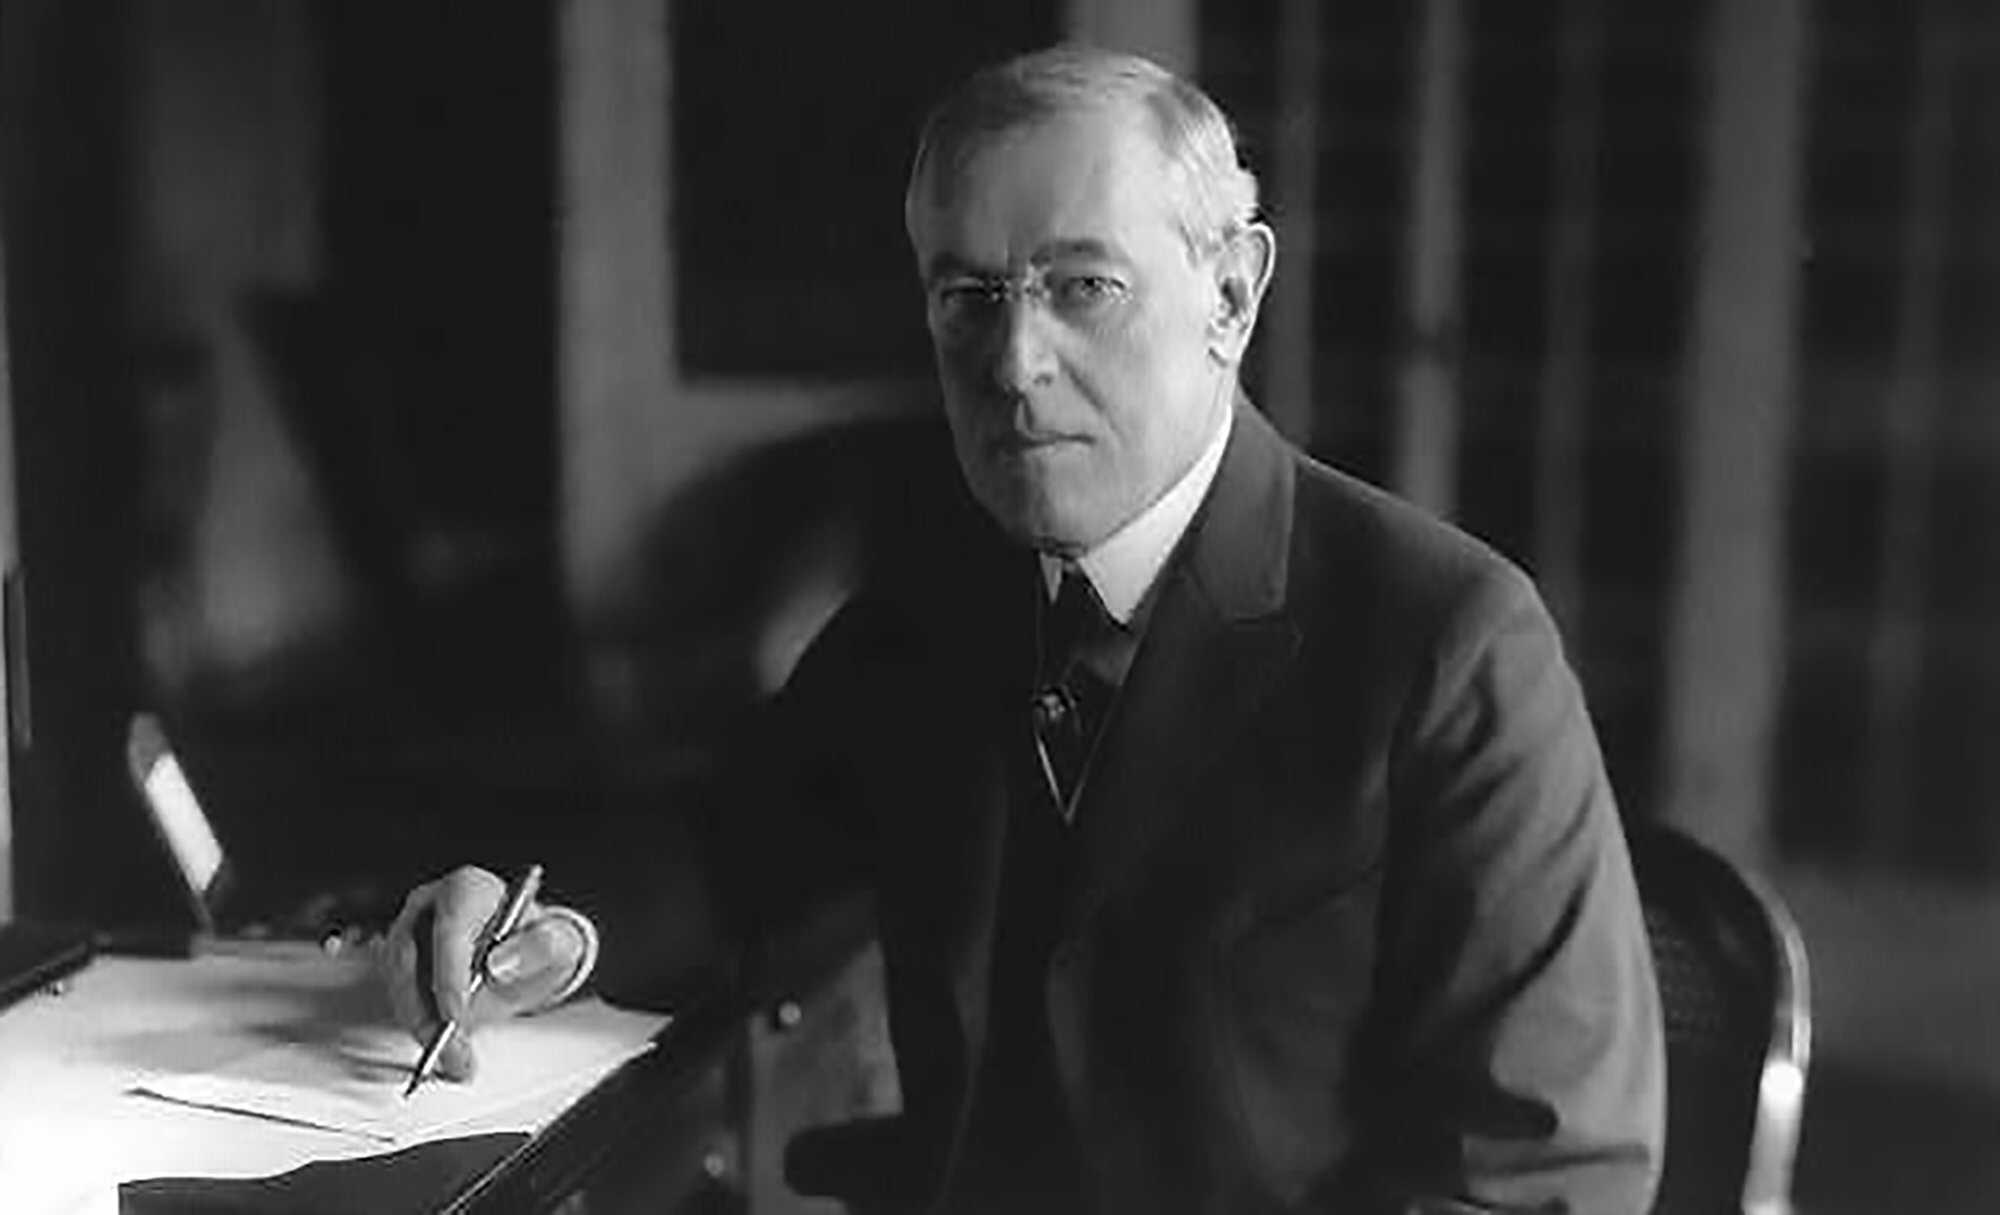 Wilson-America-at-War-1918-LOC-.jpg